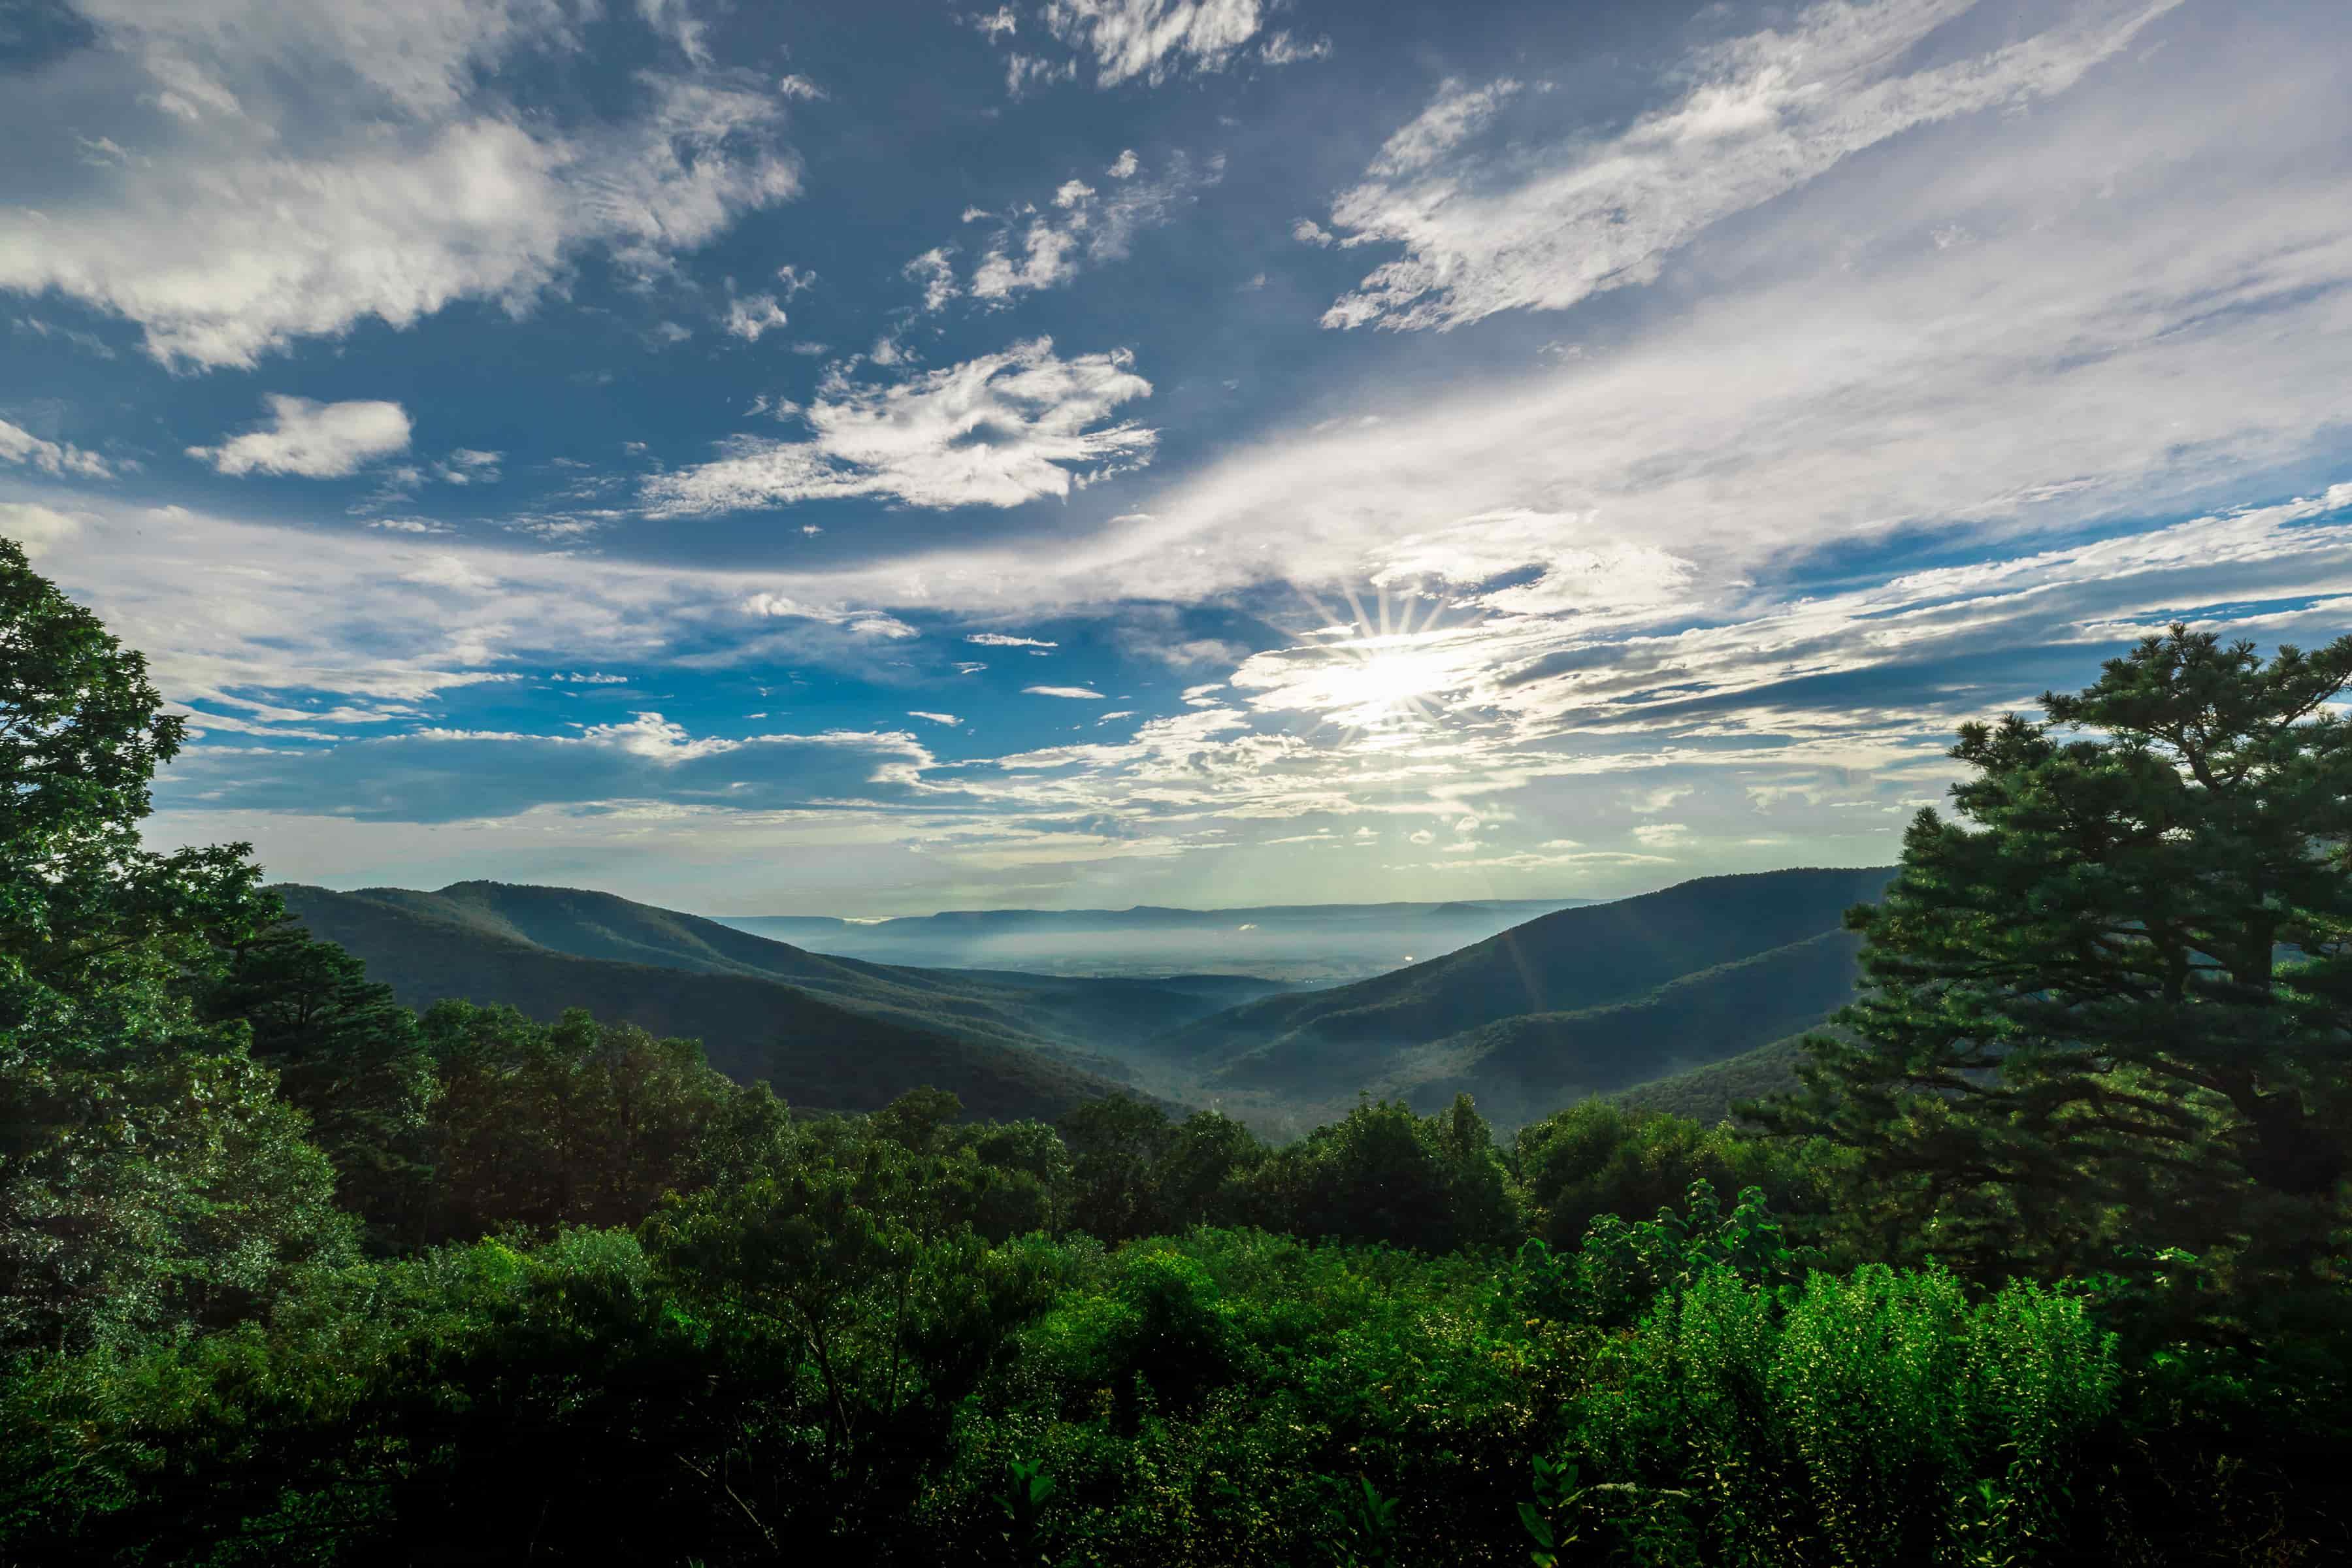 Shenandoah Valley, Blue Ridge Mountains, Sunlit cloudy sky over lush green mountains